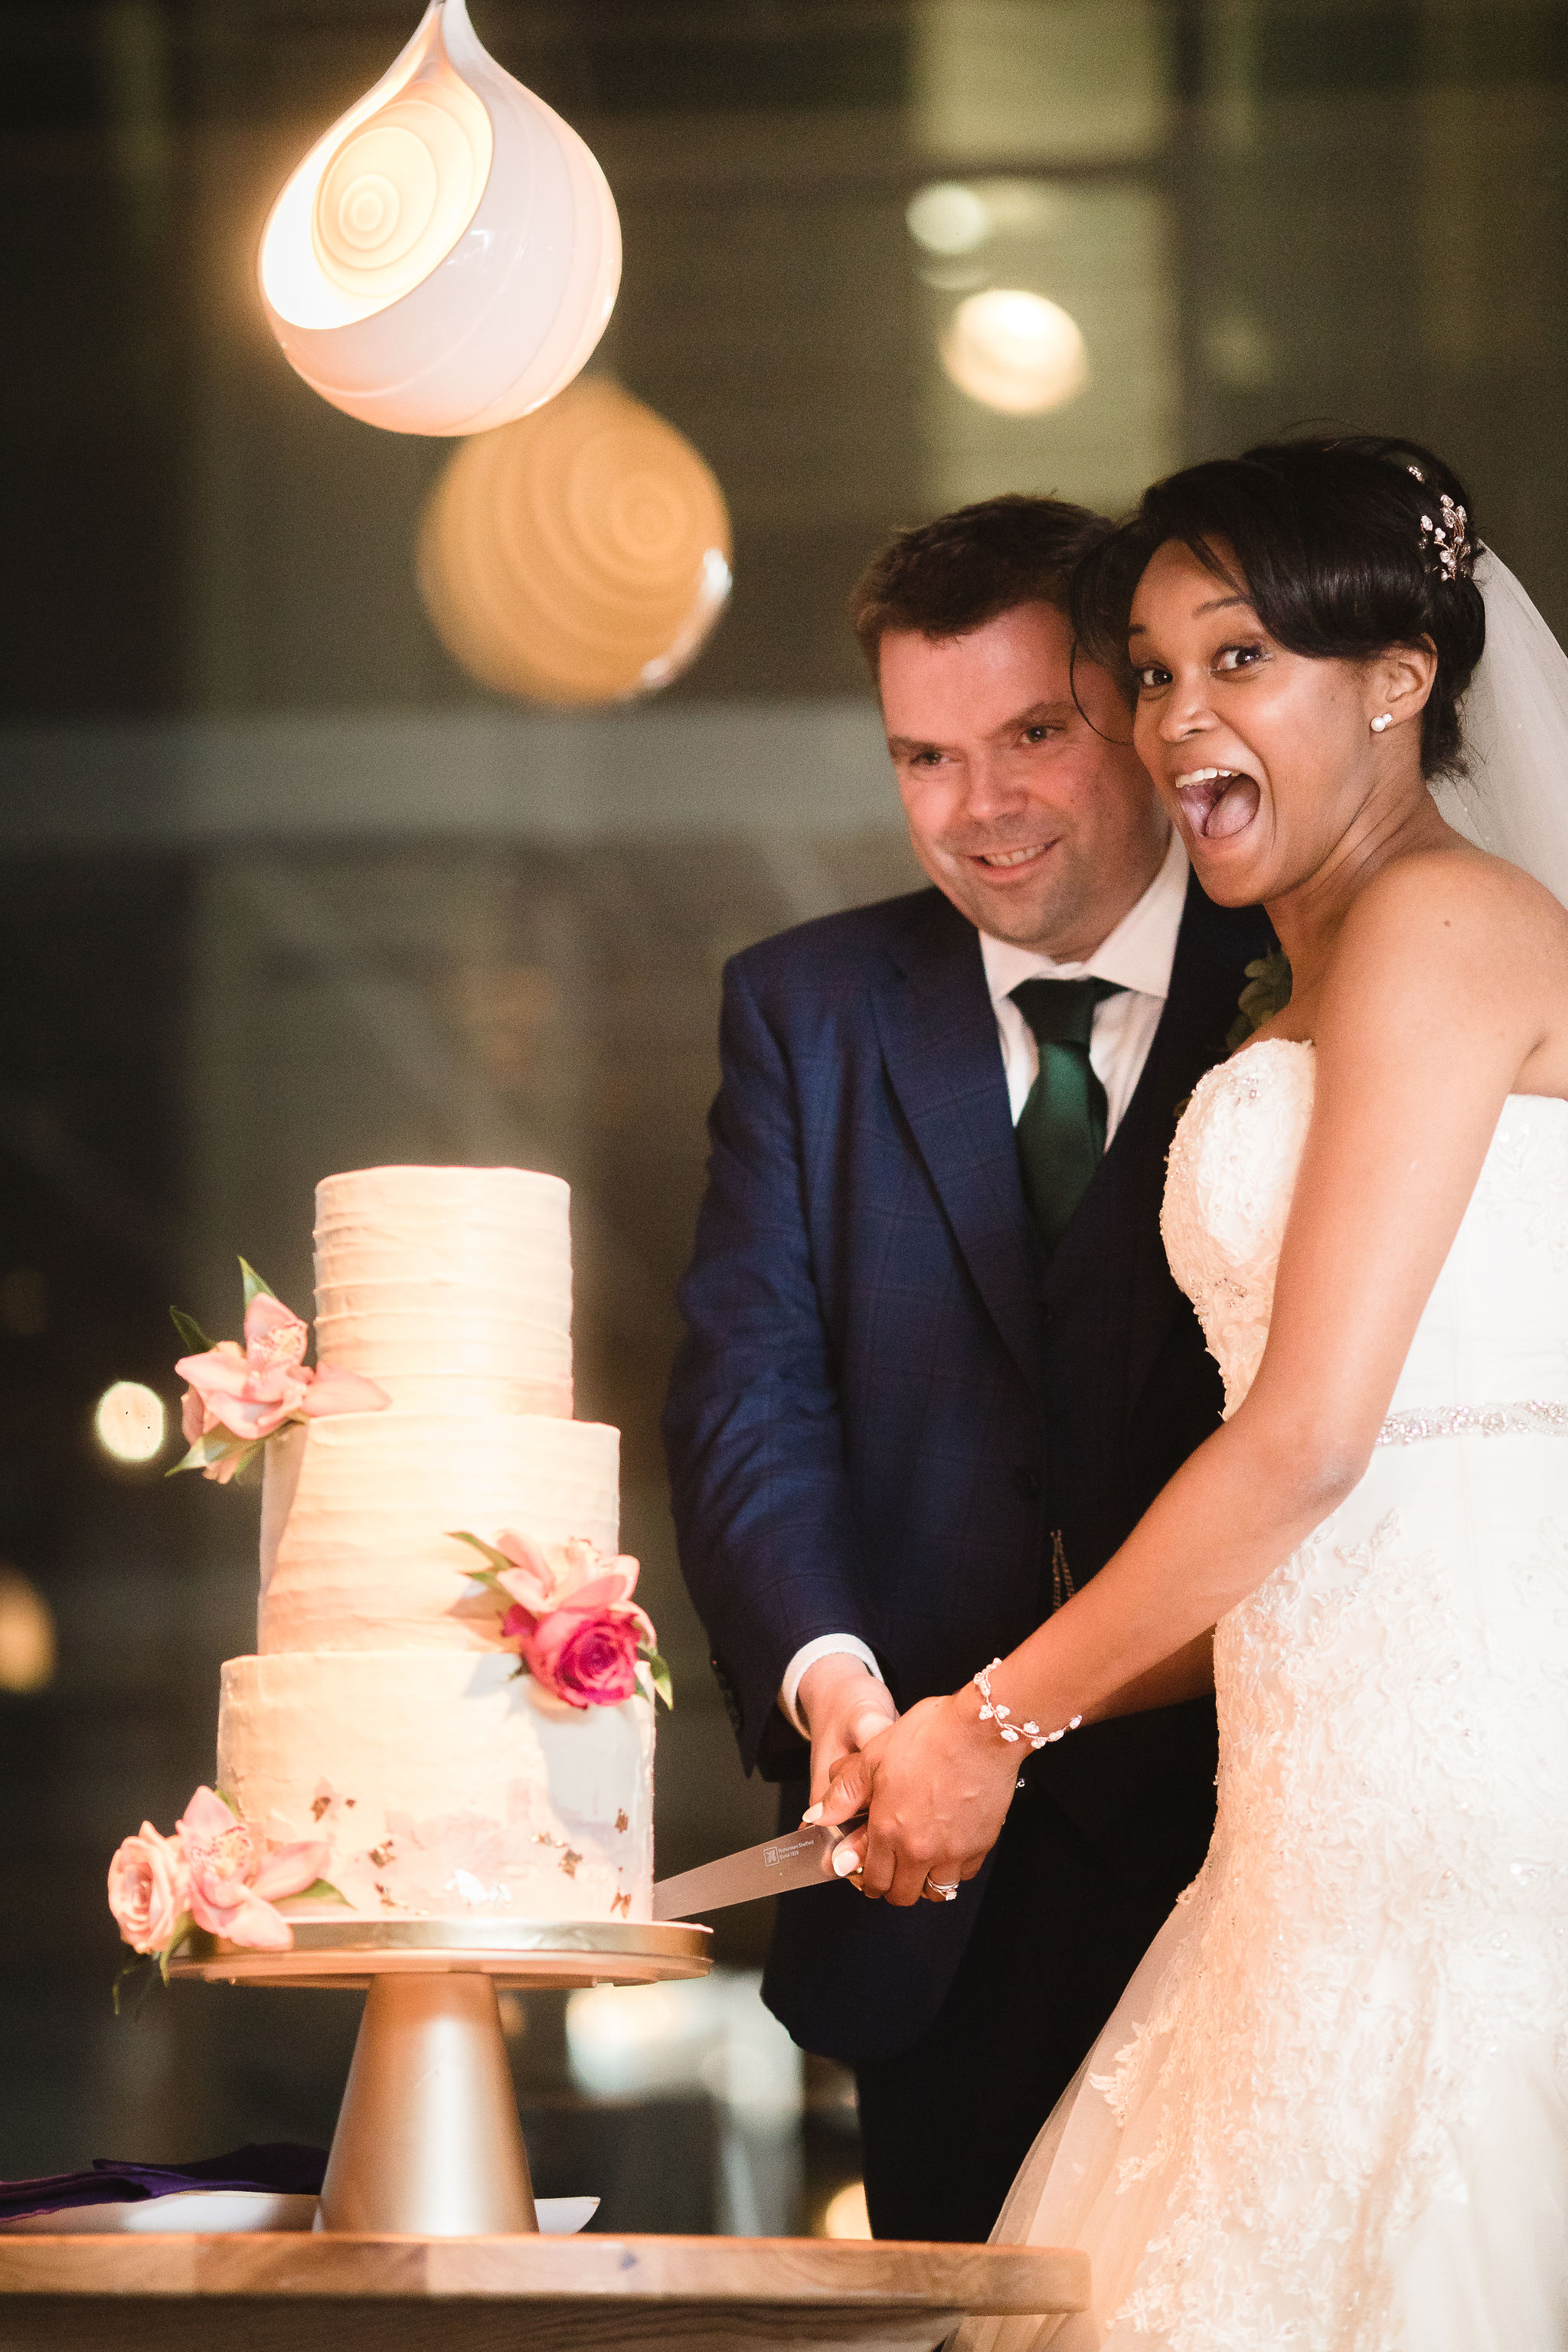 The Anthologist_Drake_and_Morgan_London_Wedding_126.jpg